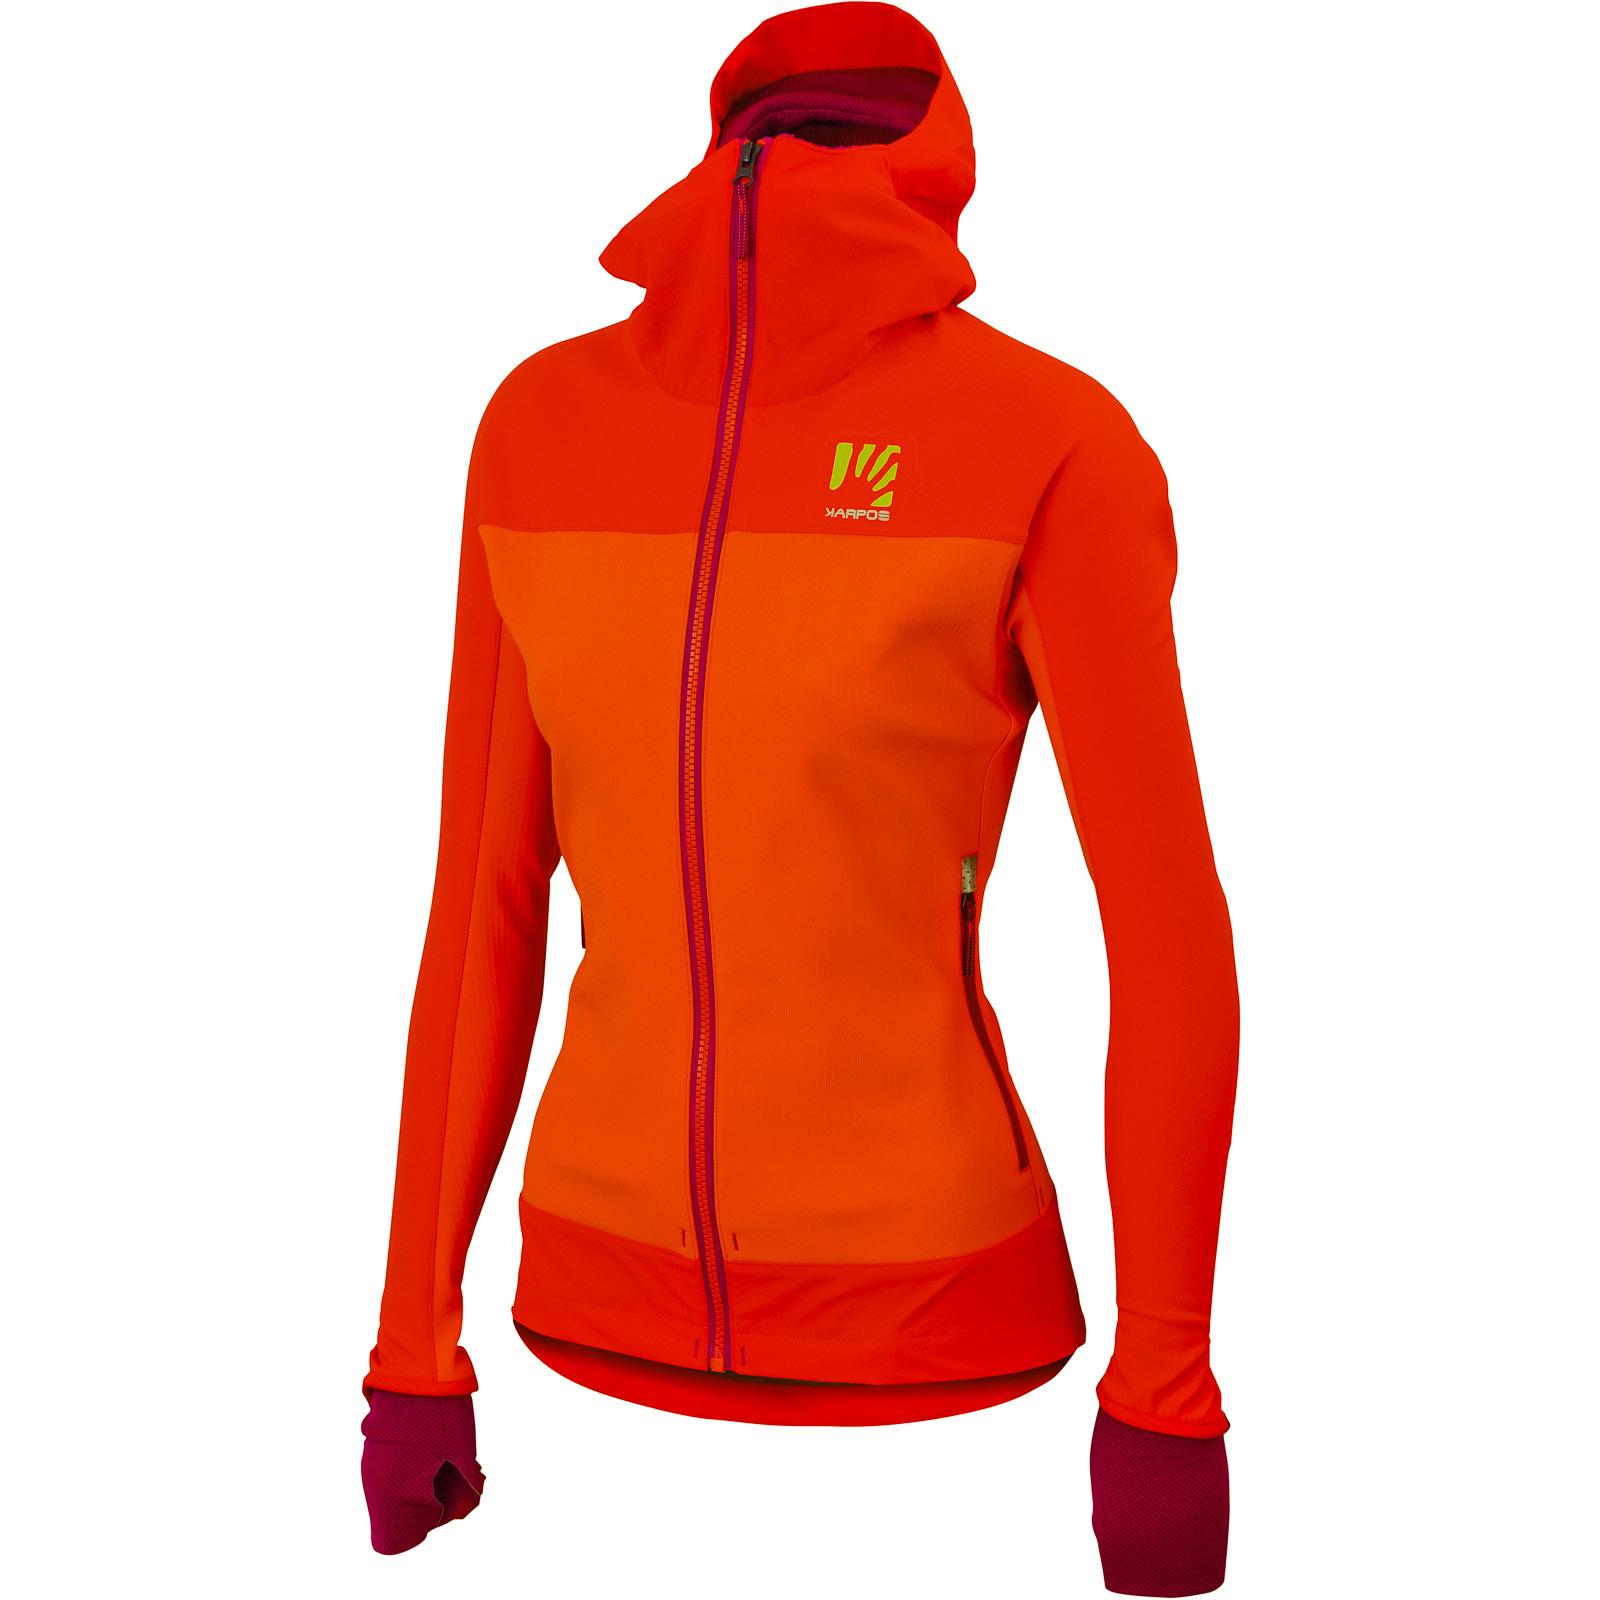 Karpos Mountain dámska bunda červená oranžová 78271ebacef